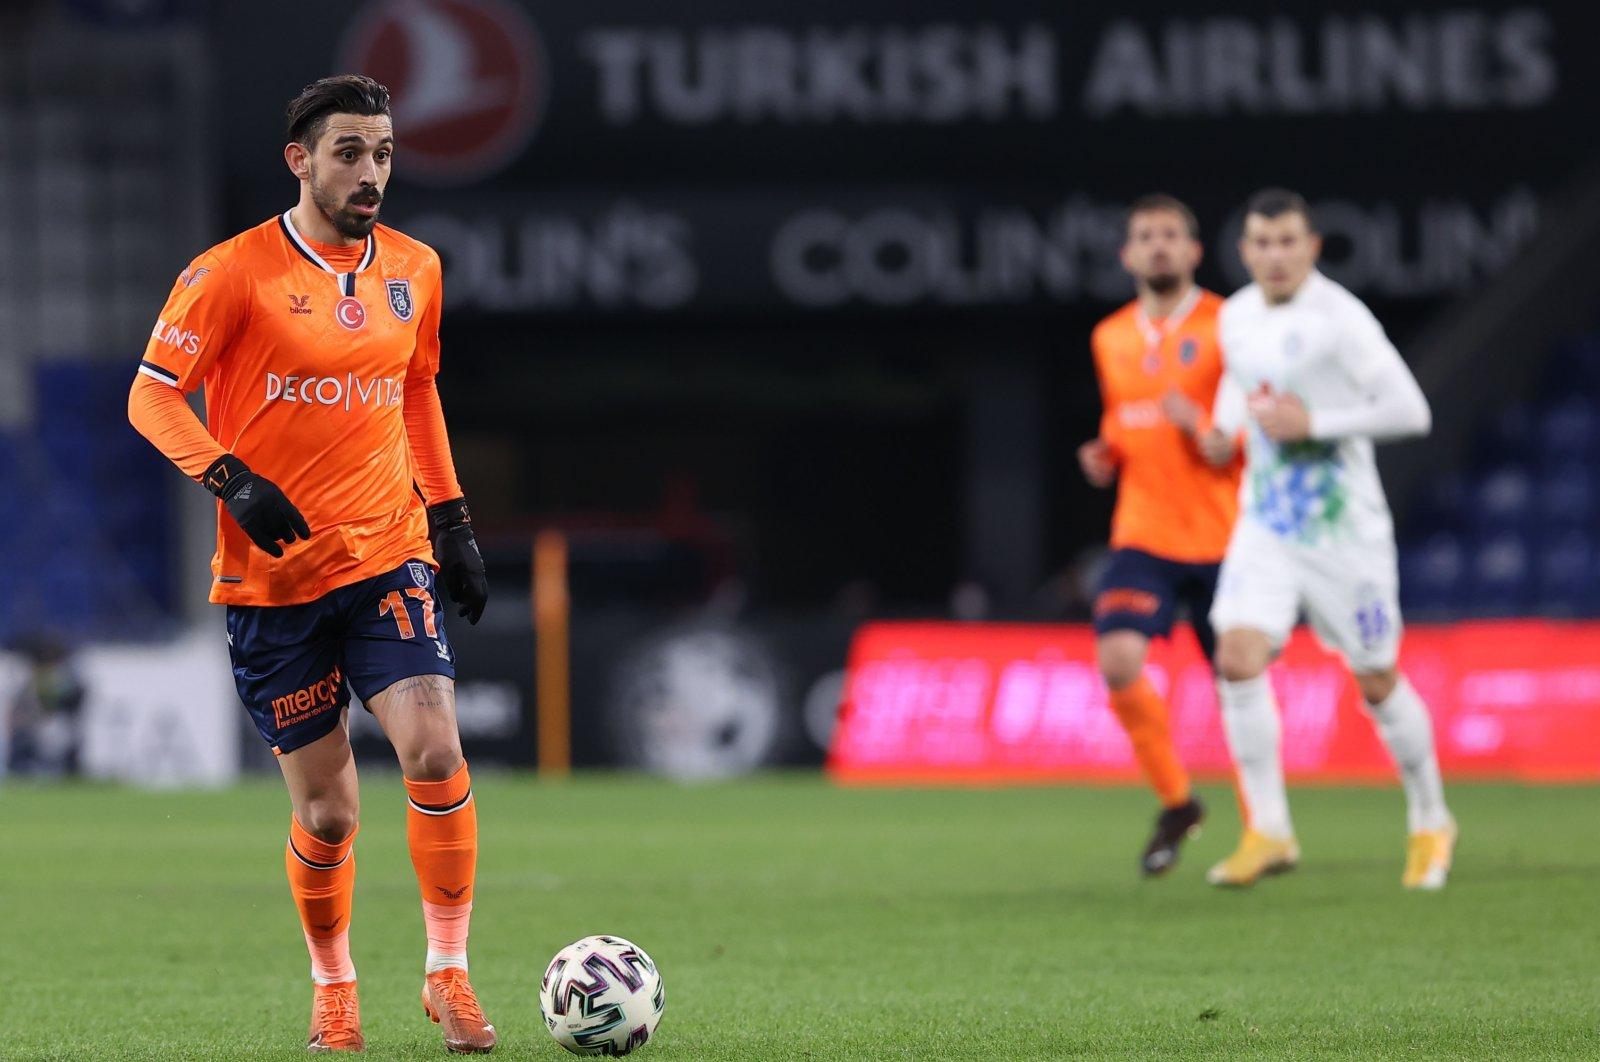 Başakşehir's Irfan Can Kahveci in action during a Süper Lig match against Rizespor at the Fatih Terim Stadium, in Istanbul, Turkey, Jan. 23, 2021. (AA Photo)